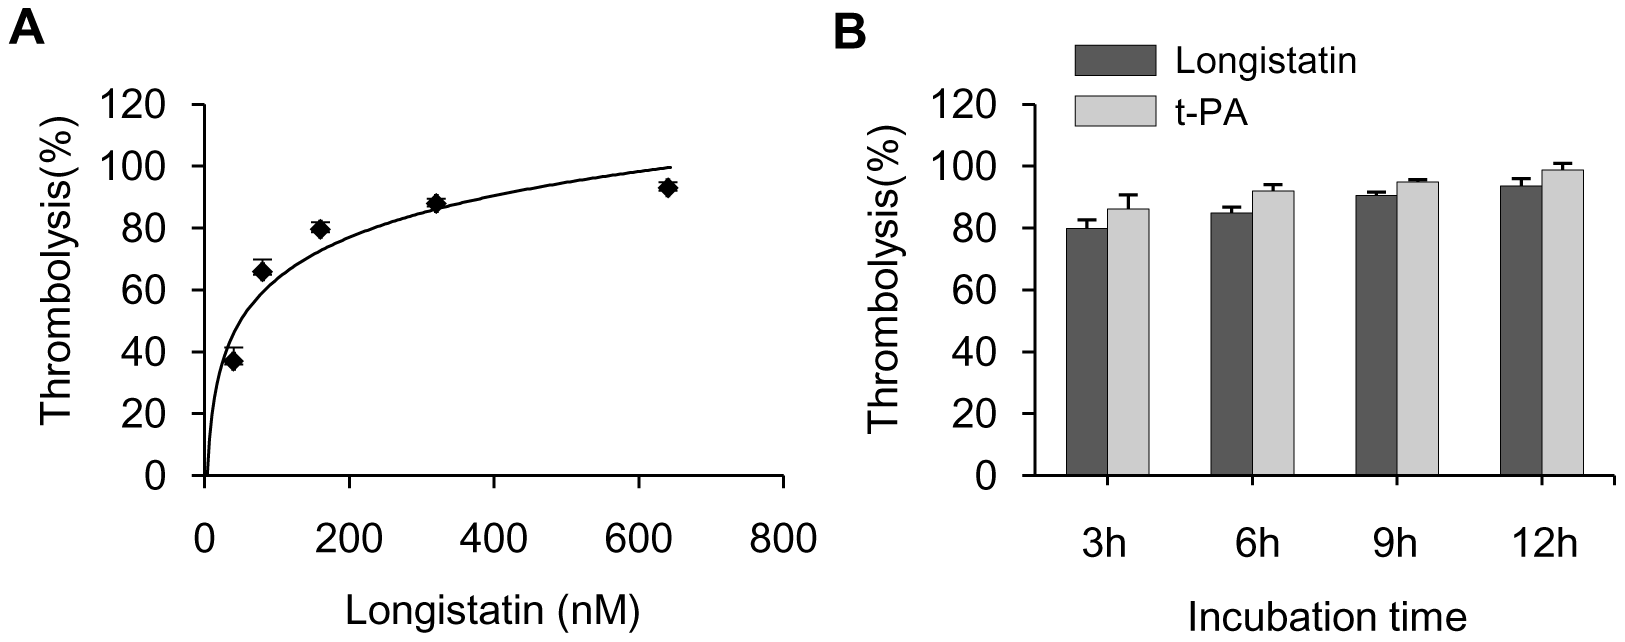 Lysis of platelet-rich thrombi by longistatin in dog plasma.